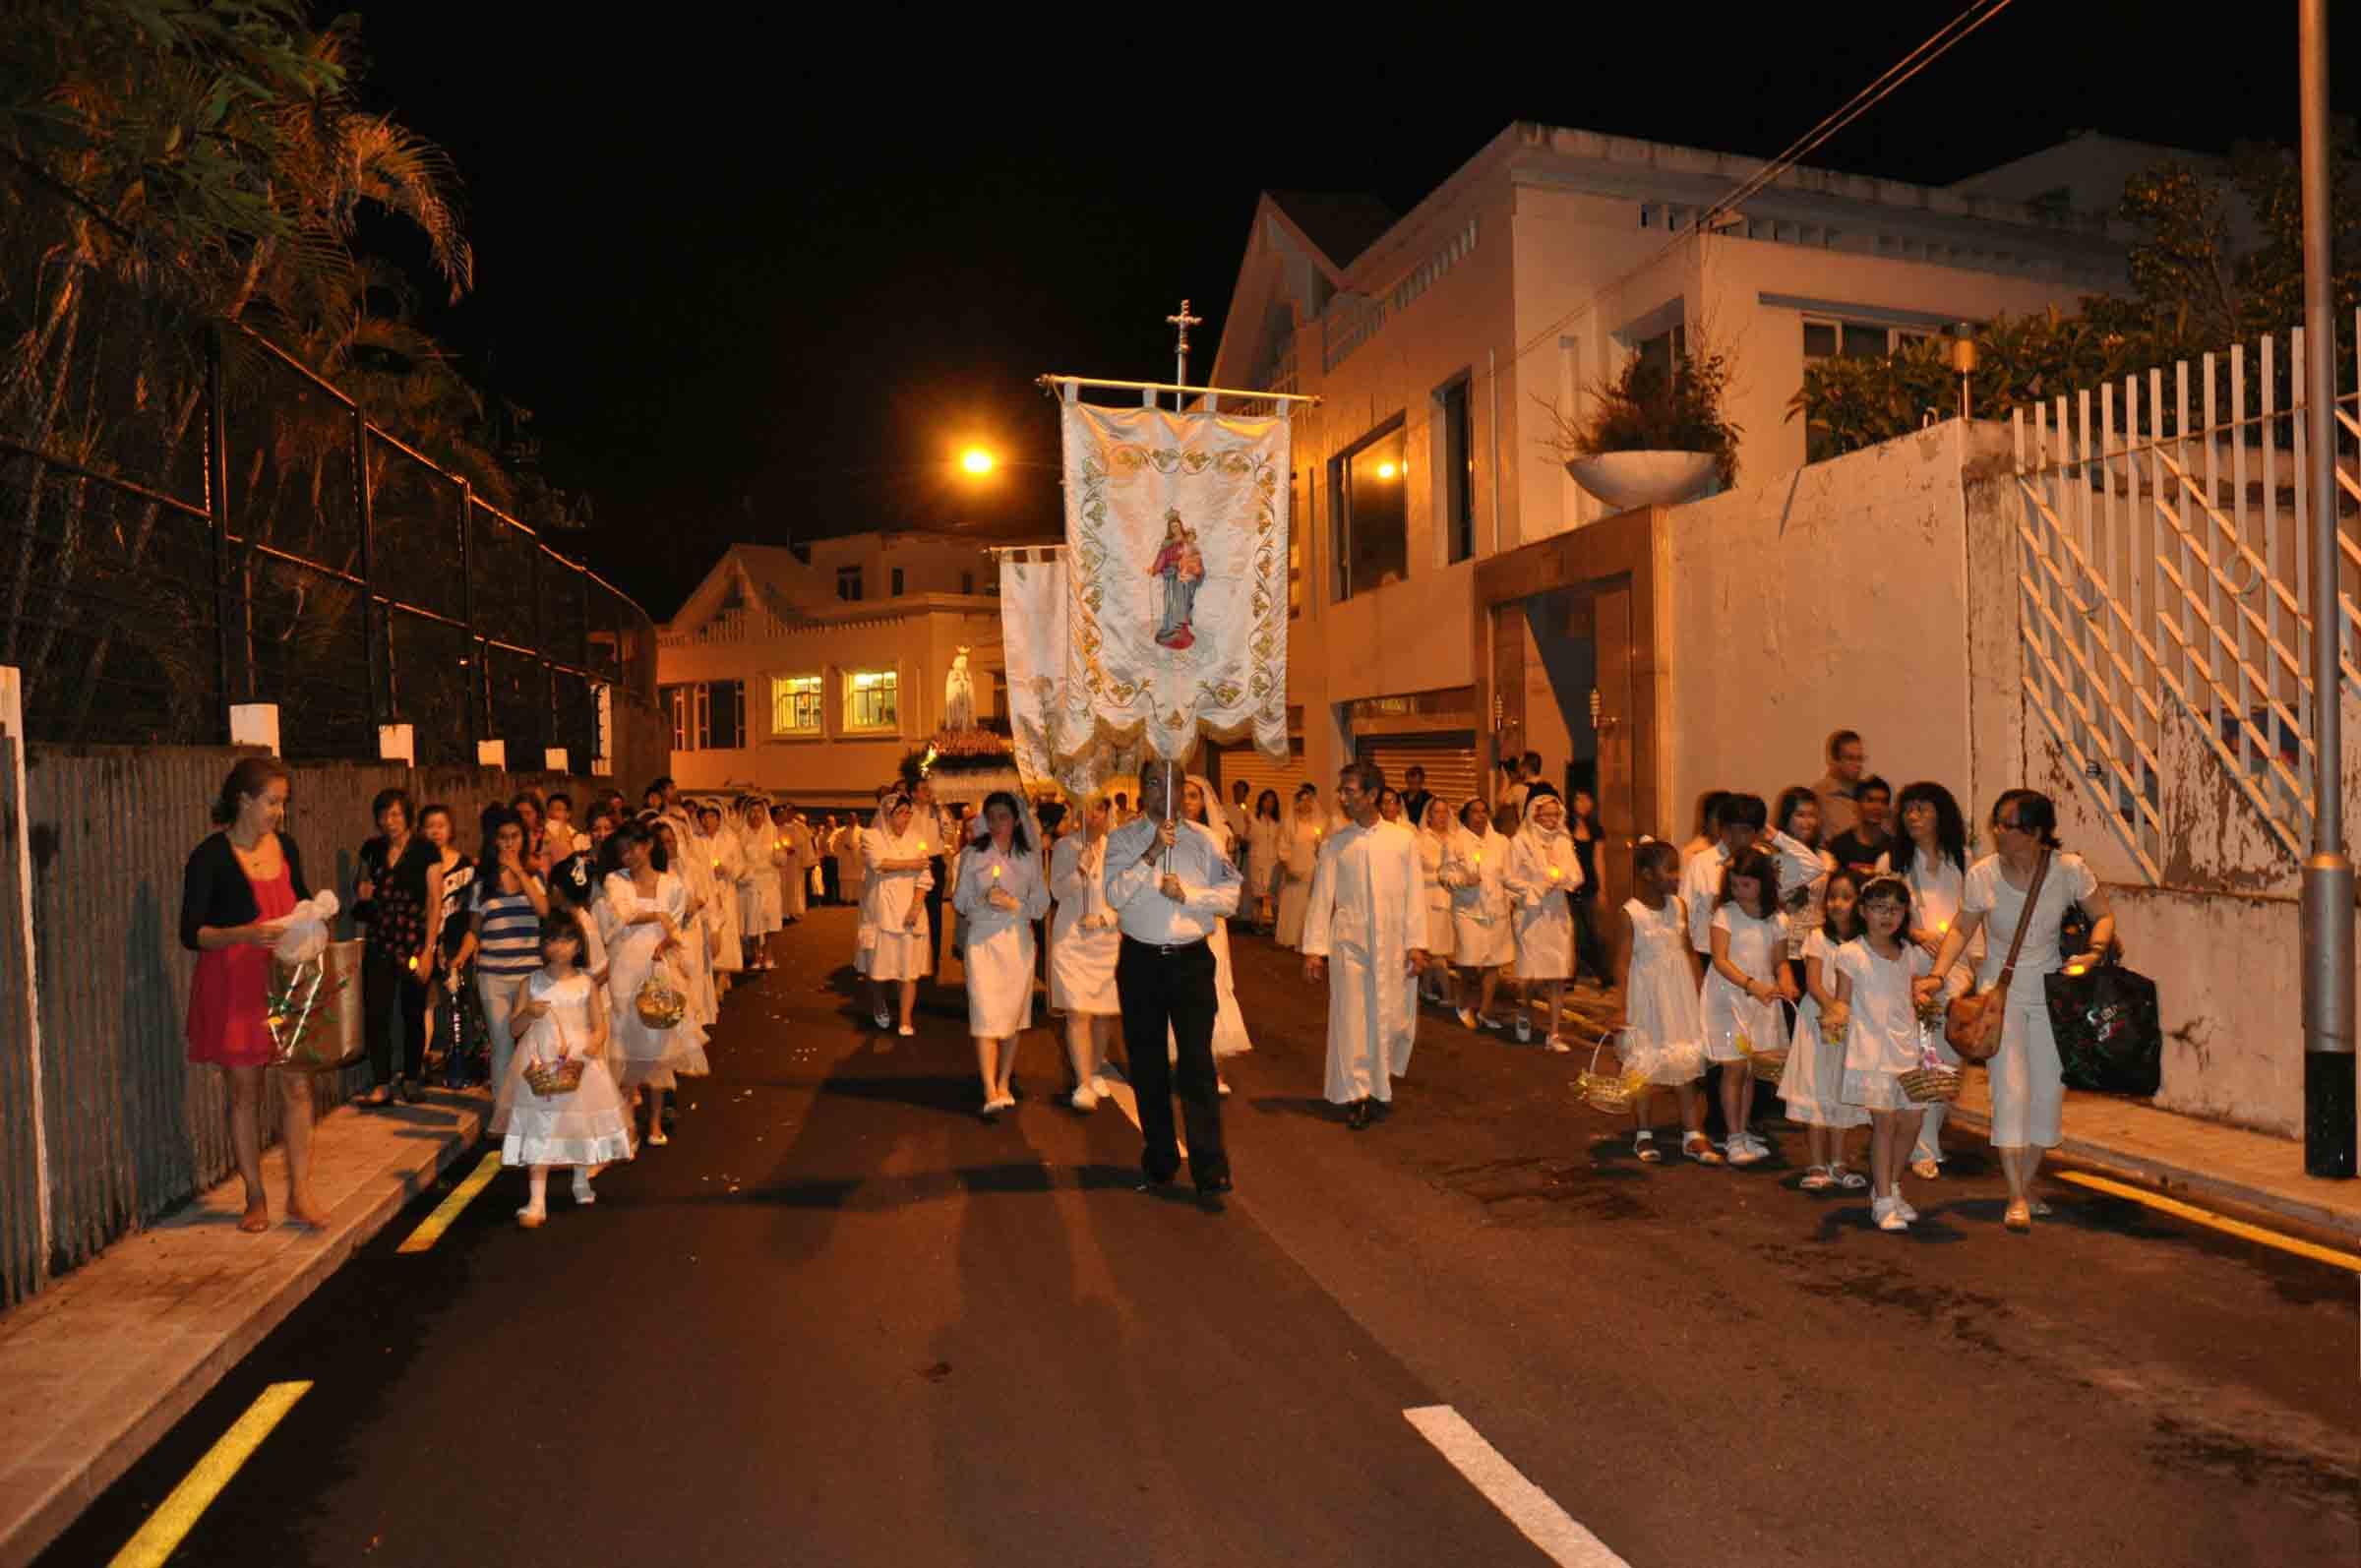 Macau's Our Lady of Fatima Procession walking on Penha Hill